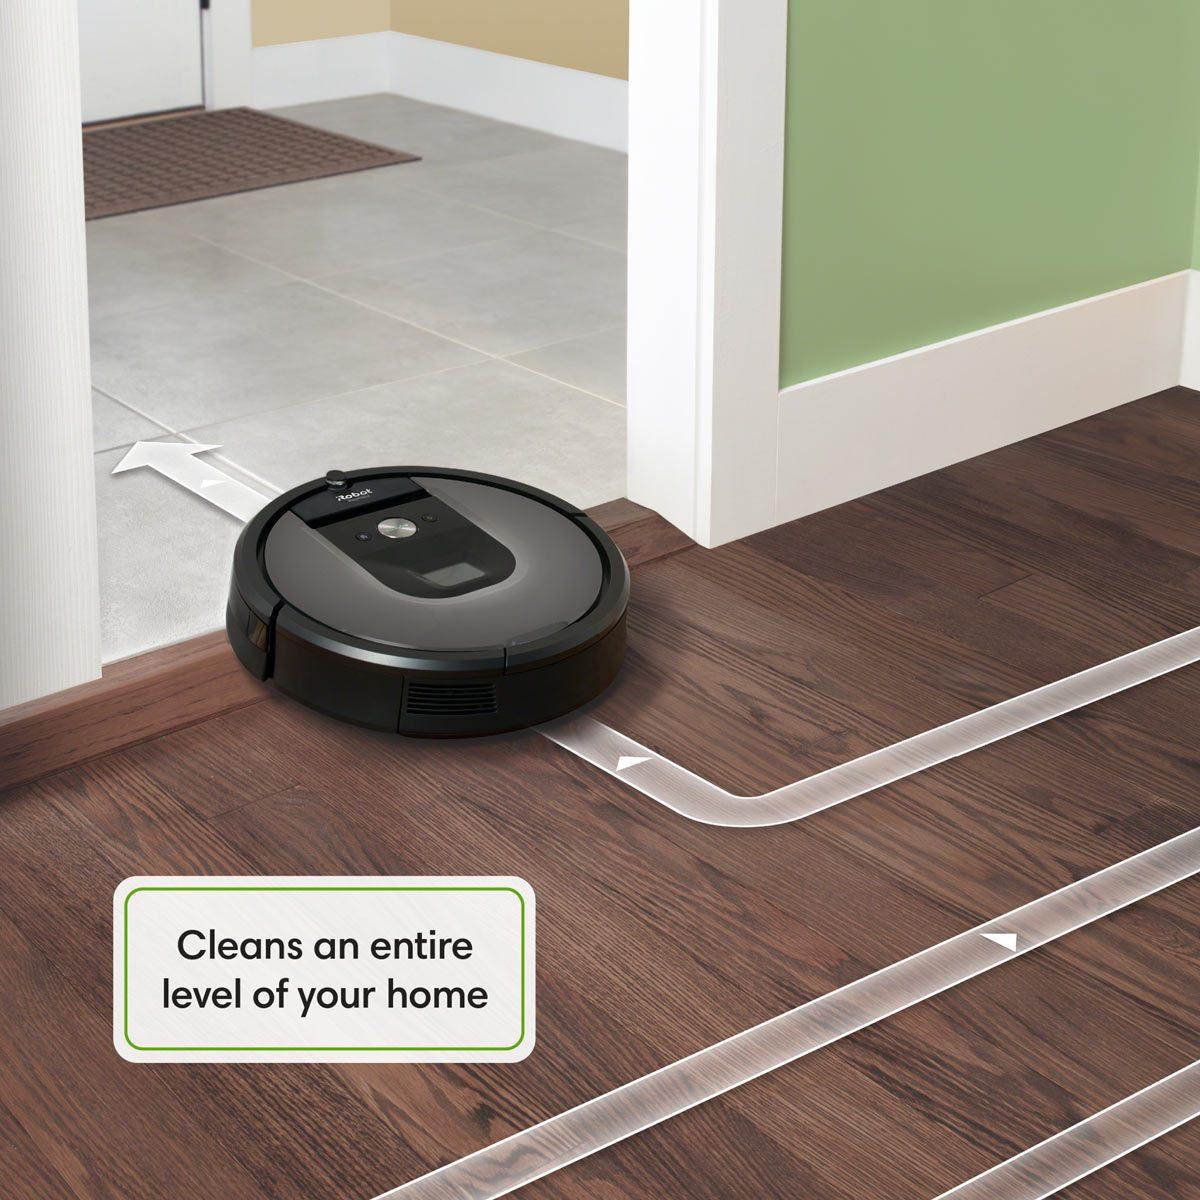 irobot vacuum